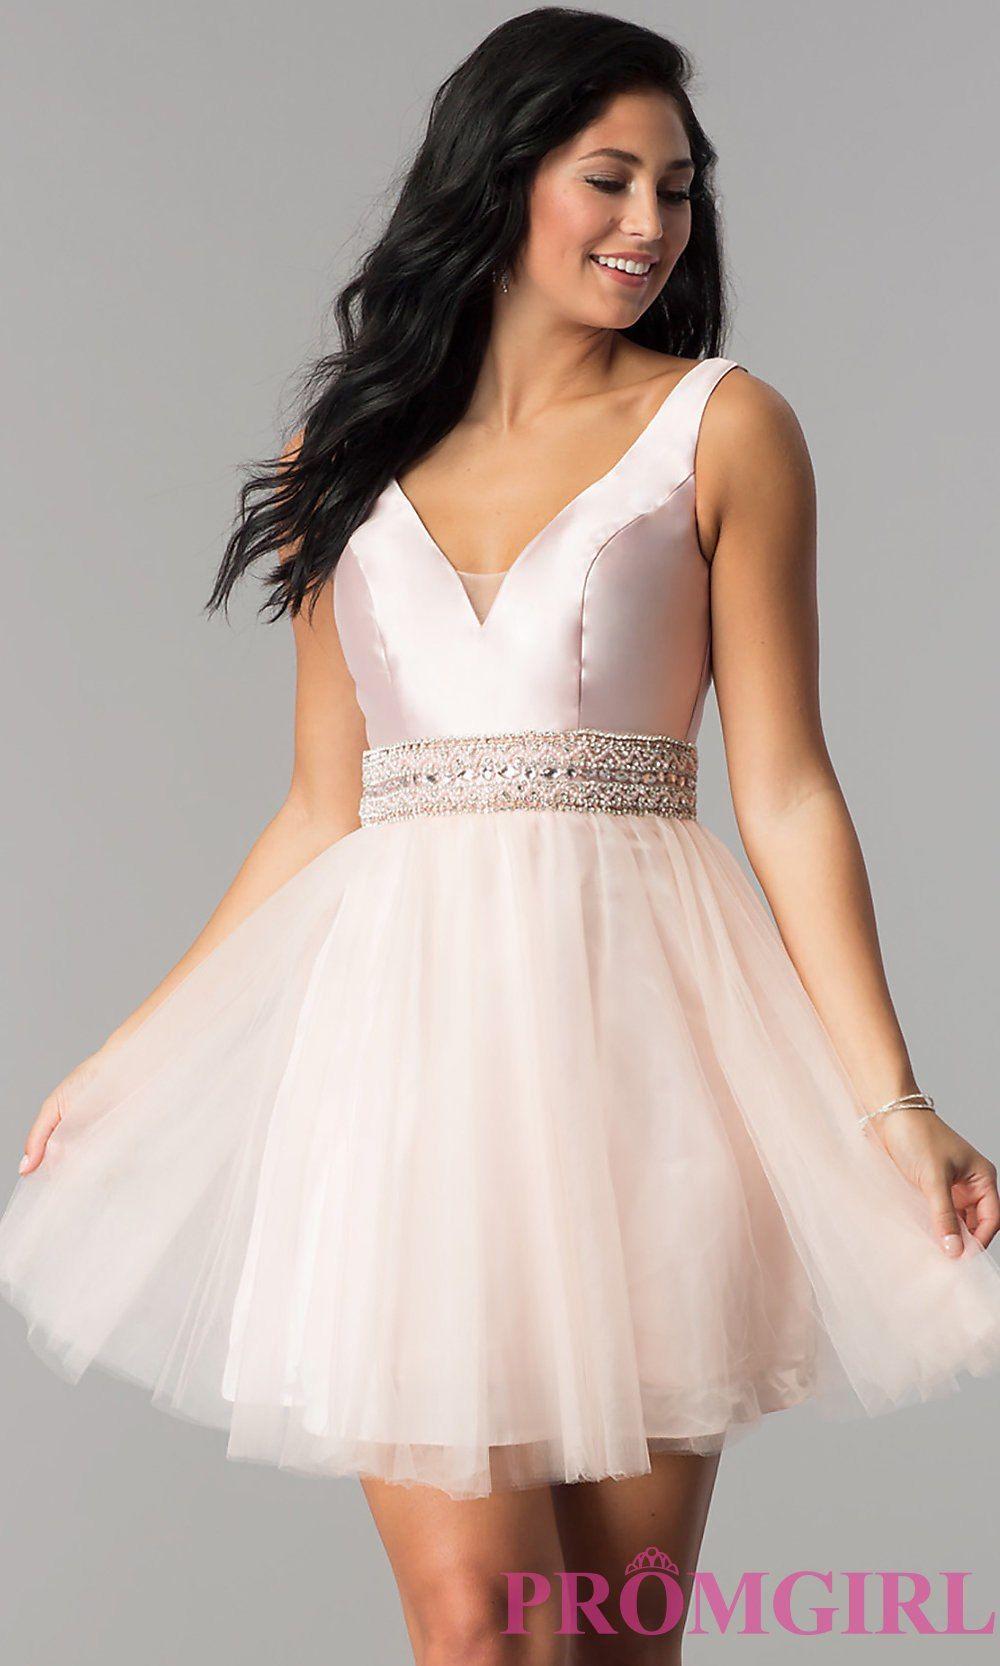 Sleeveless vneck semiformal prom dress promgirl quince